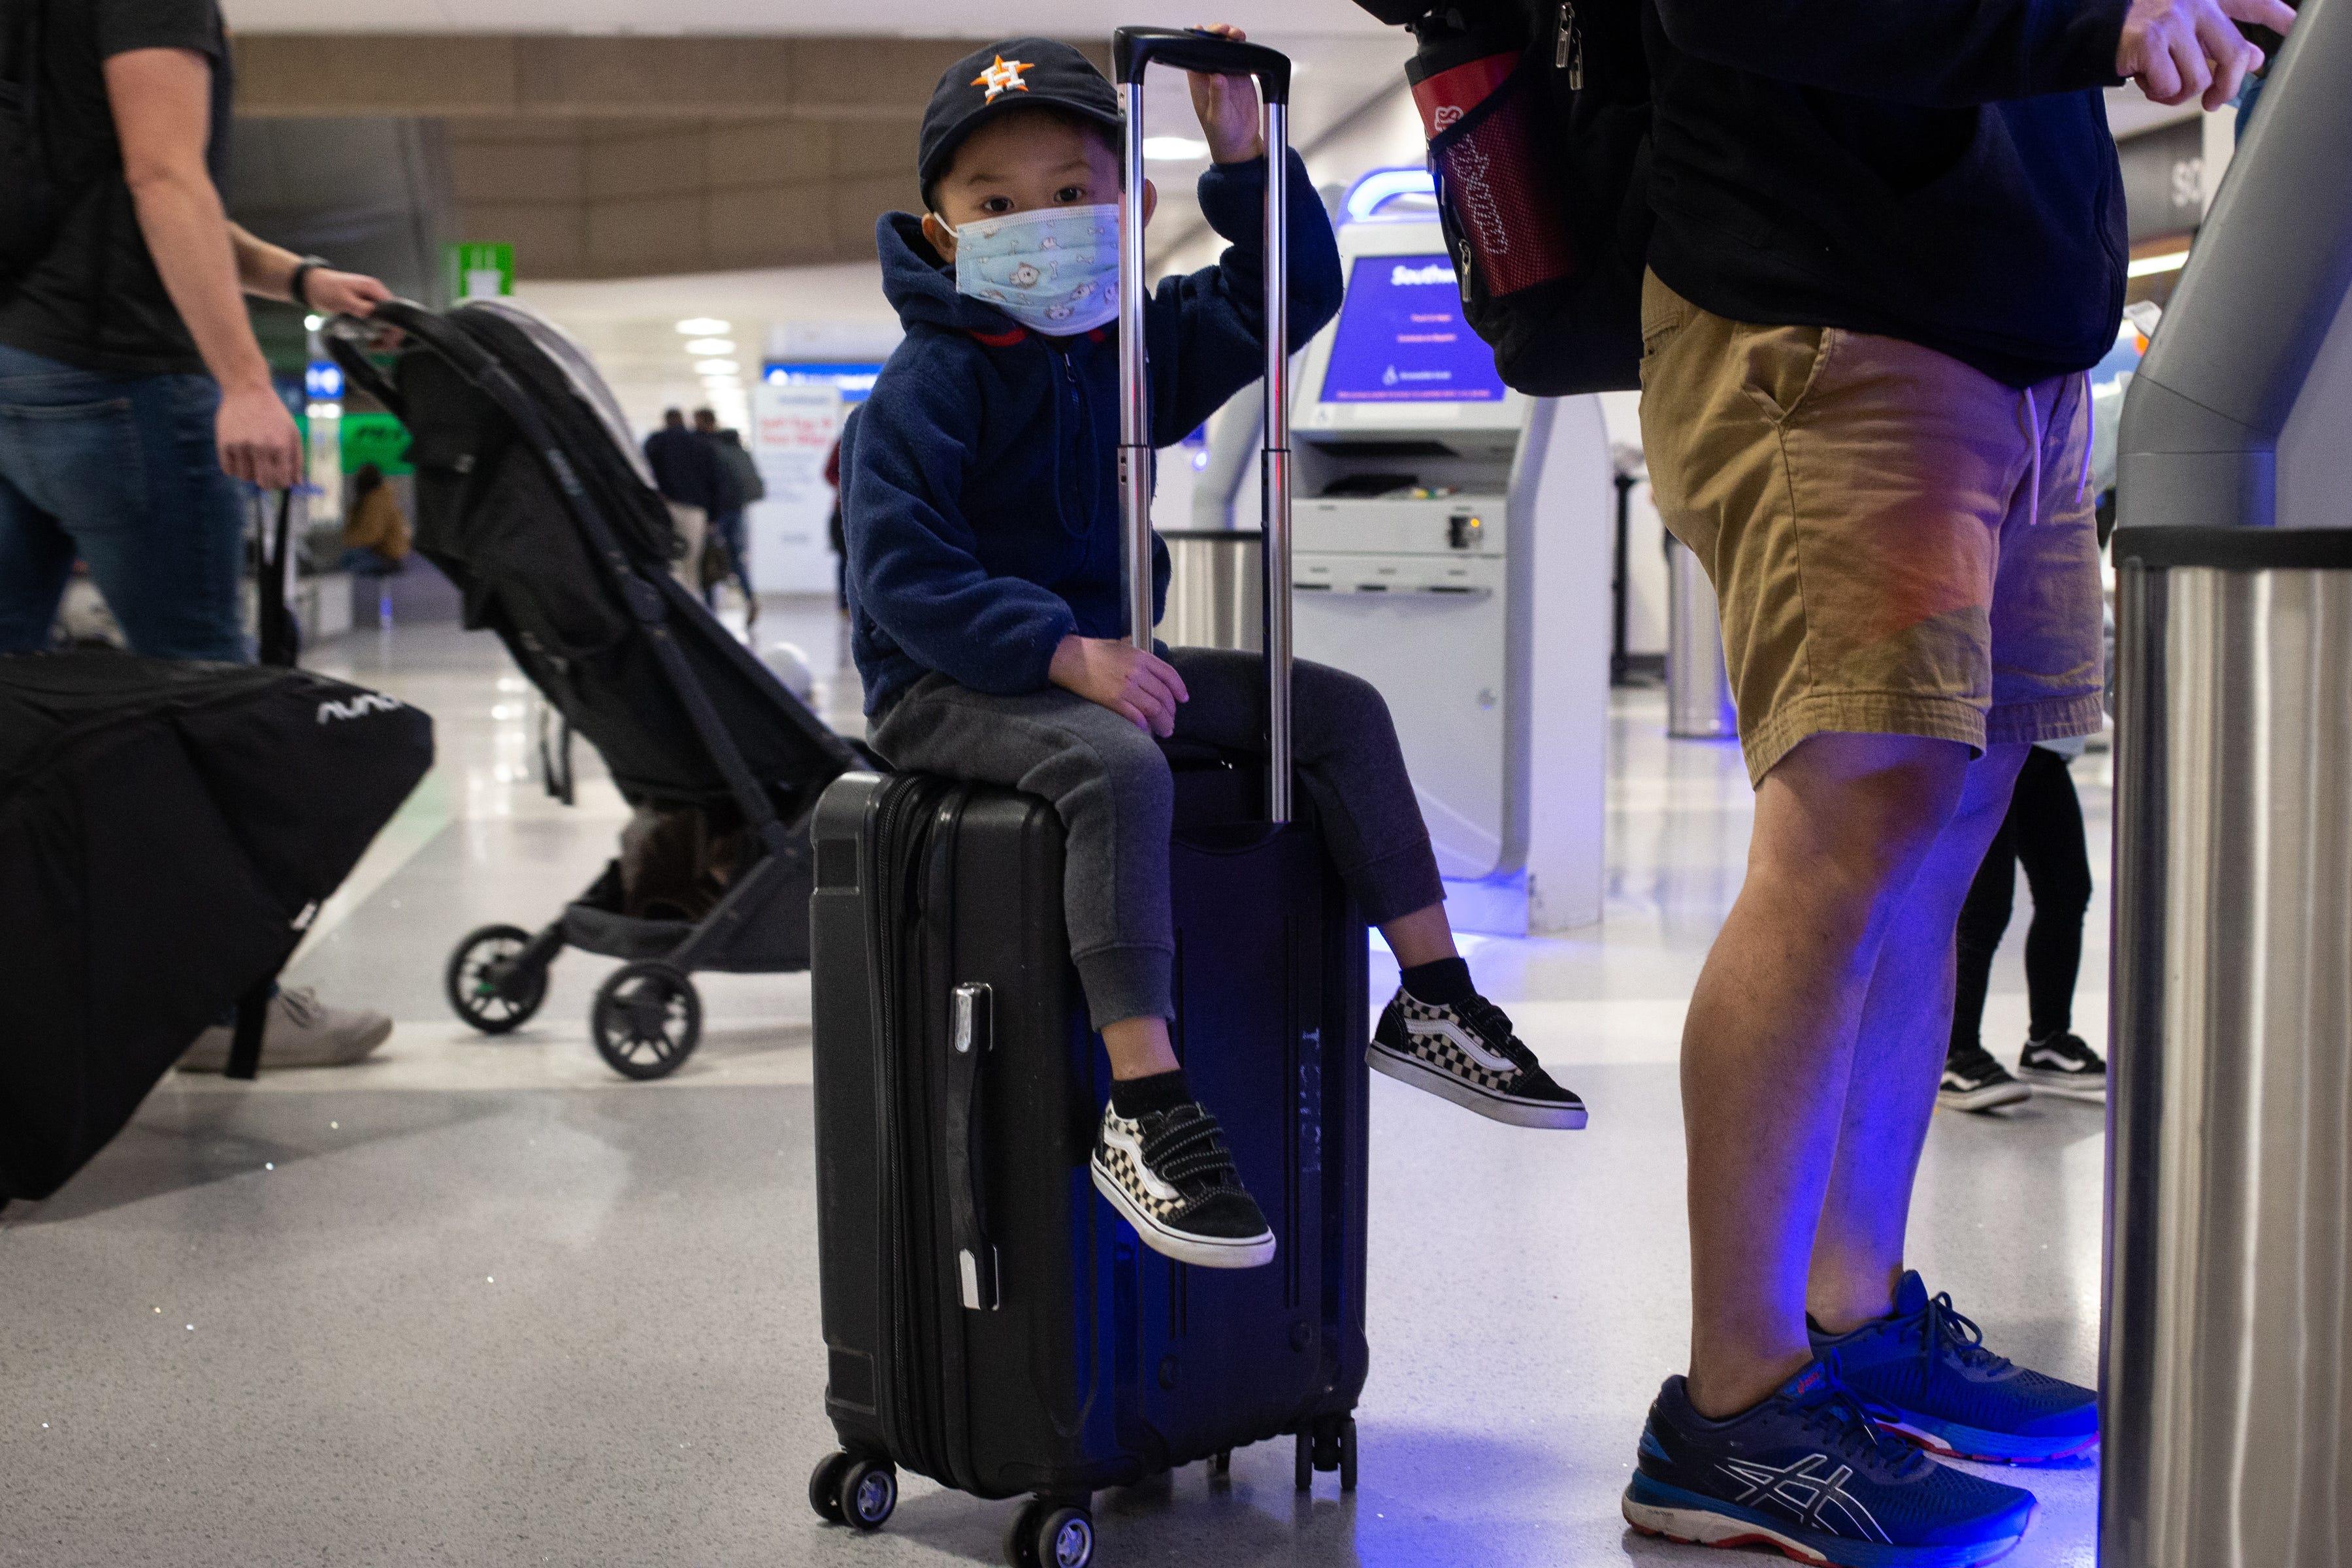 Holiday travel rush begins: TSA screened more than 1 million passengers Friday